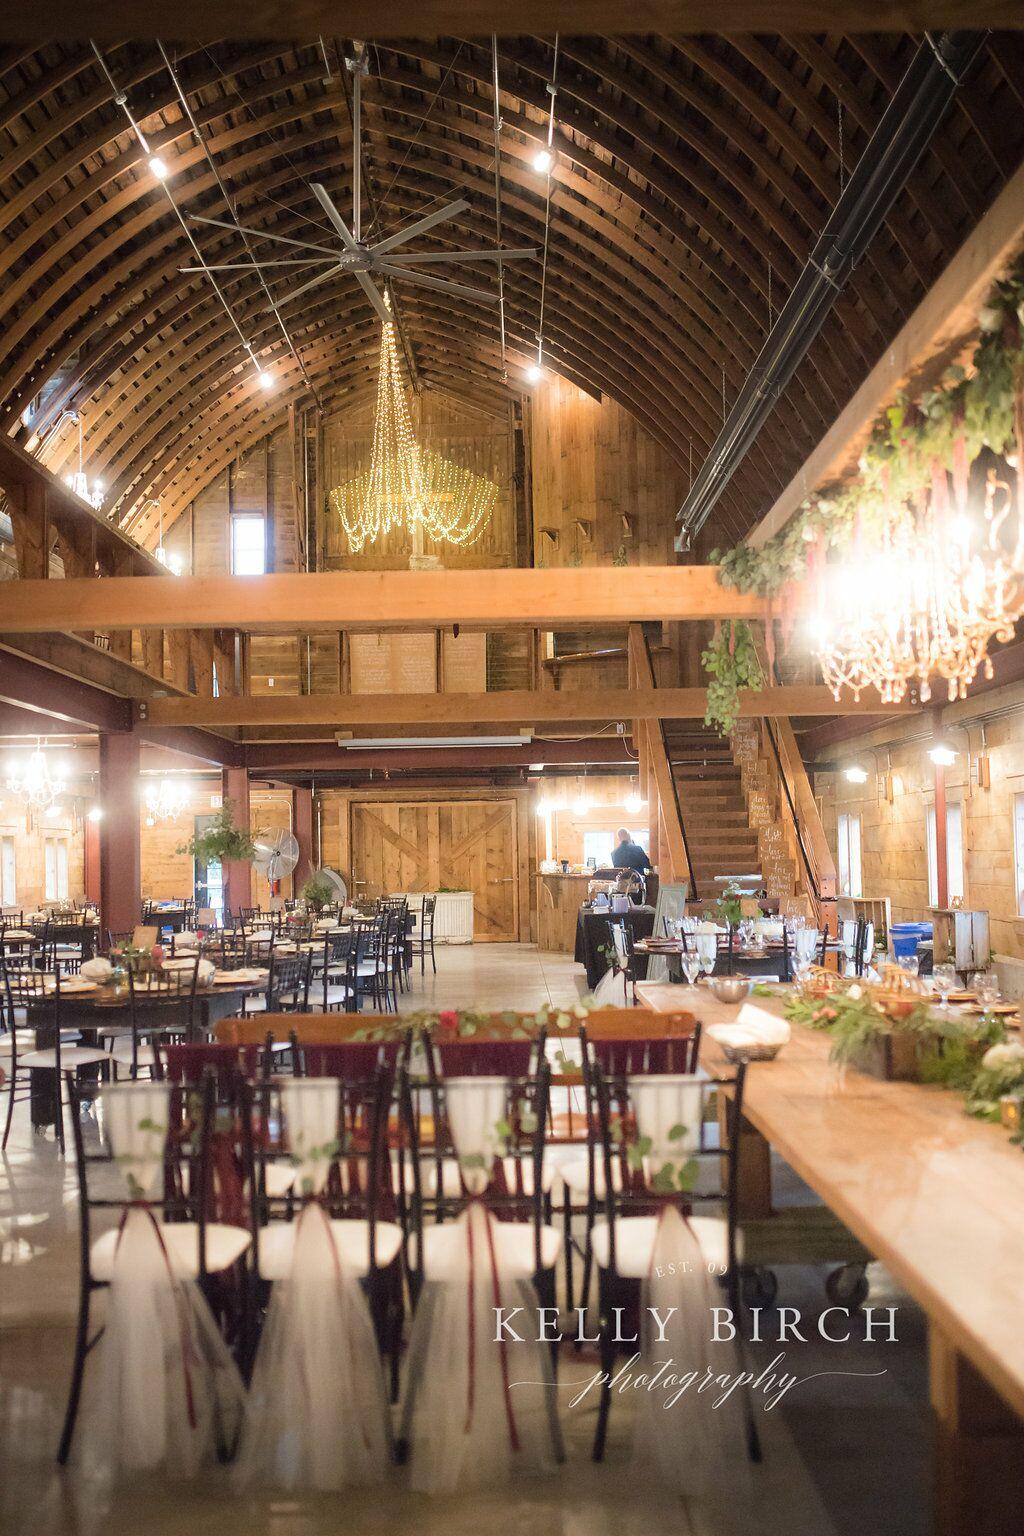 Wedding reception venues in minneapolis mn the knot historic john p furber farm new barn venue junglespirit Choice Image